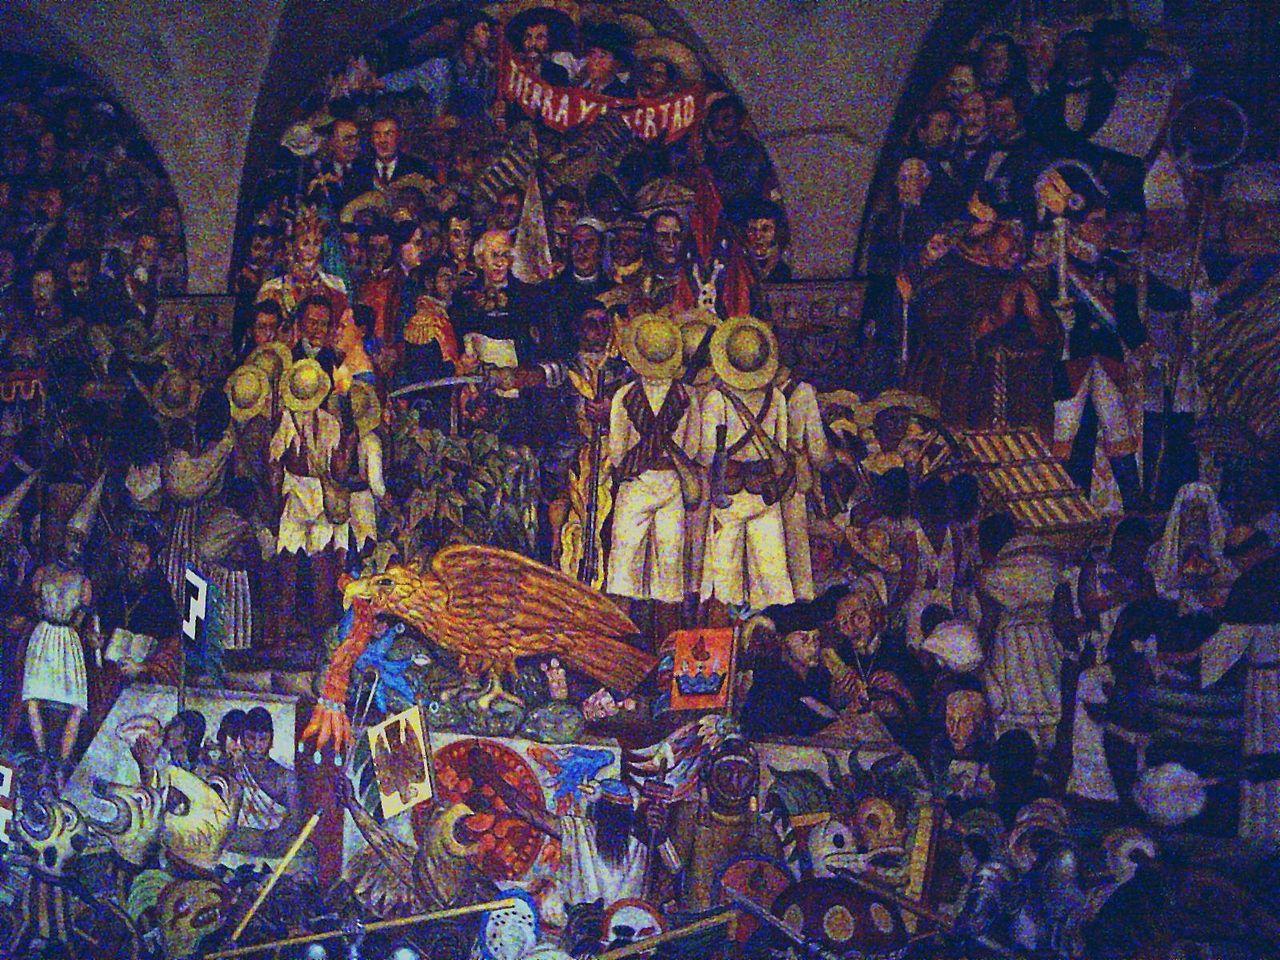 1280px-Mural_Diego_Rivera